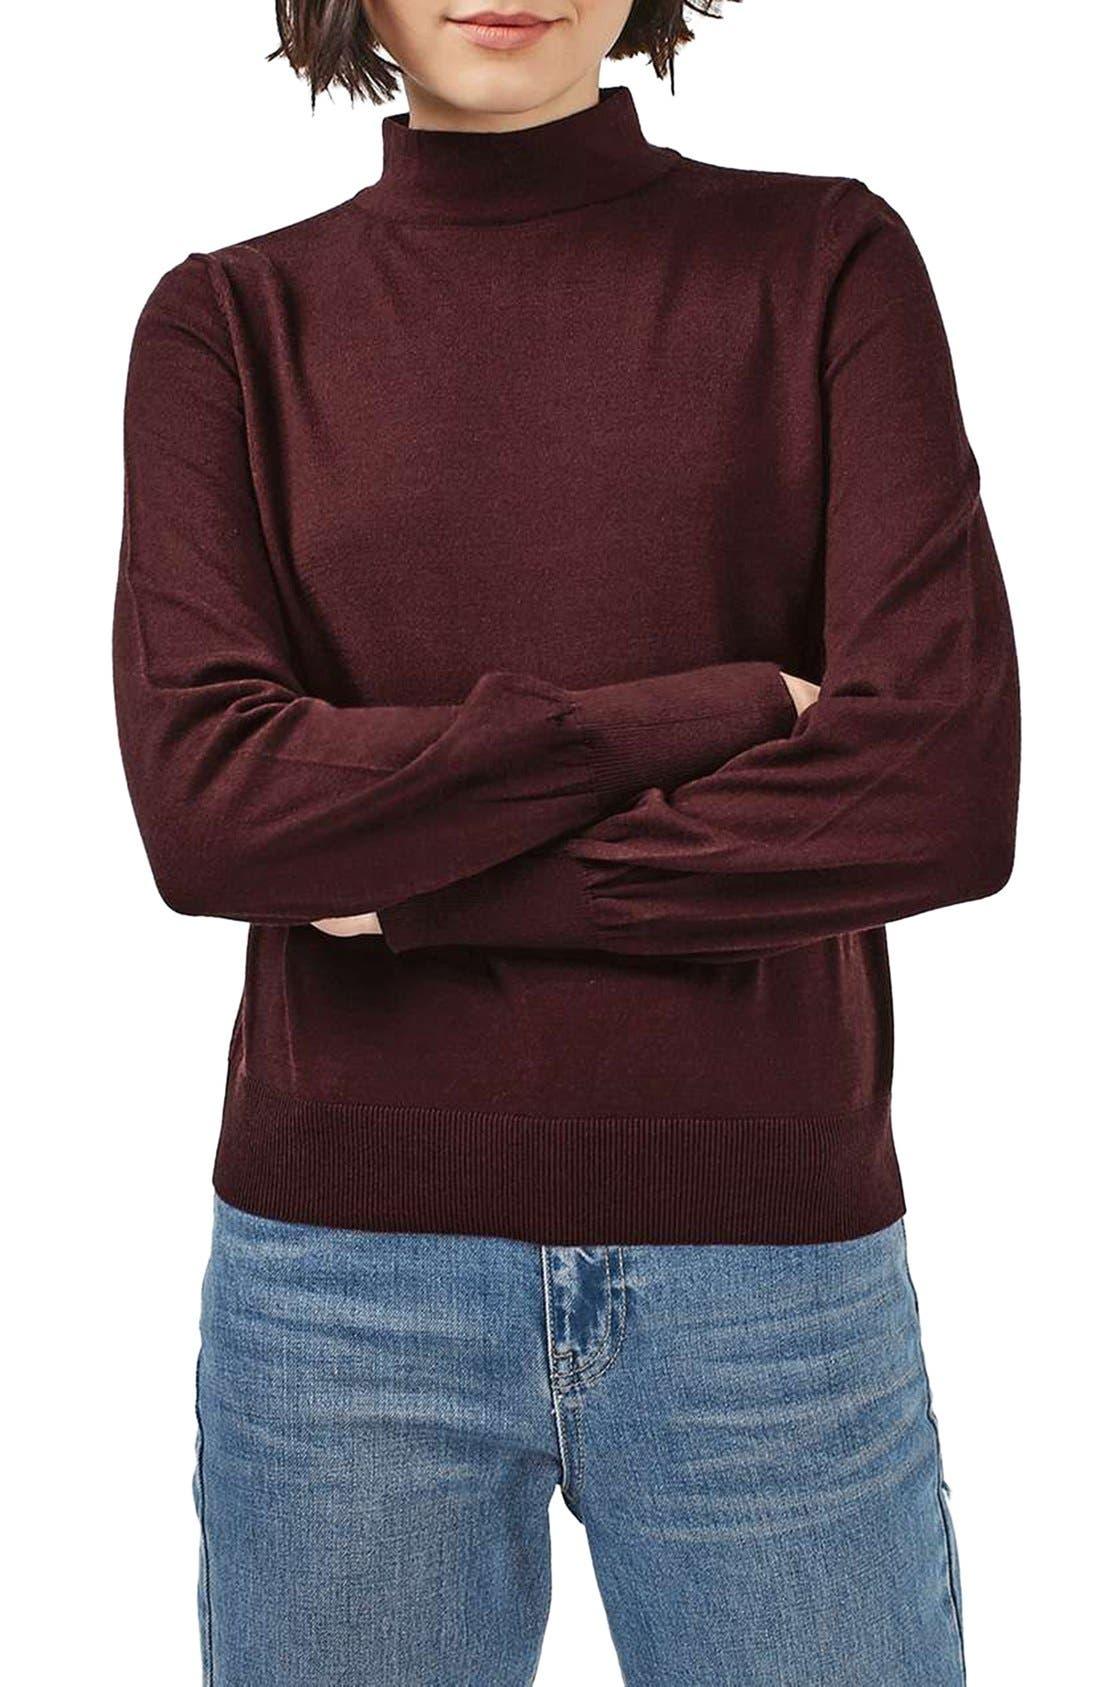 Alternate Image 1 Selected - Topshop Blouson Sleeve Mock Neck Sweater